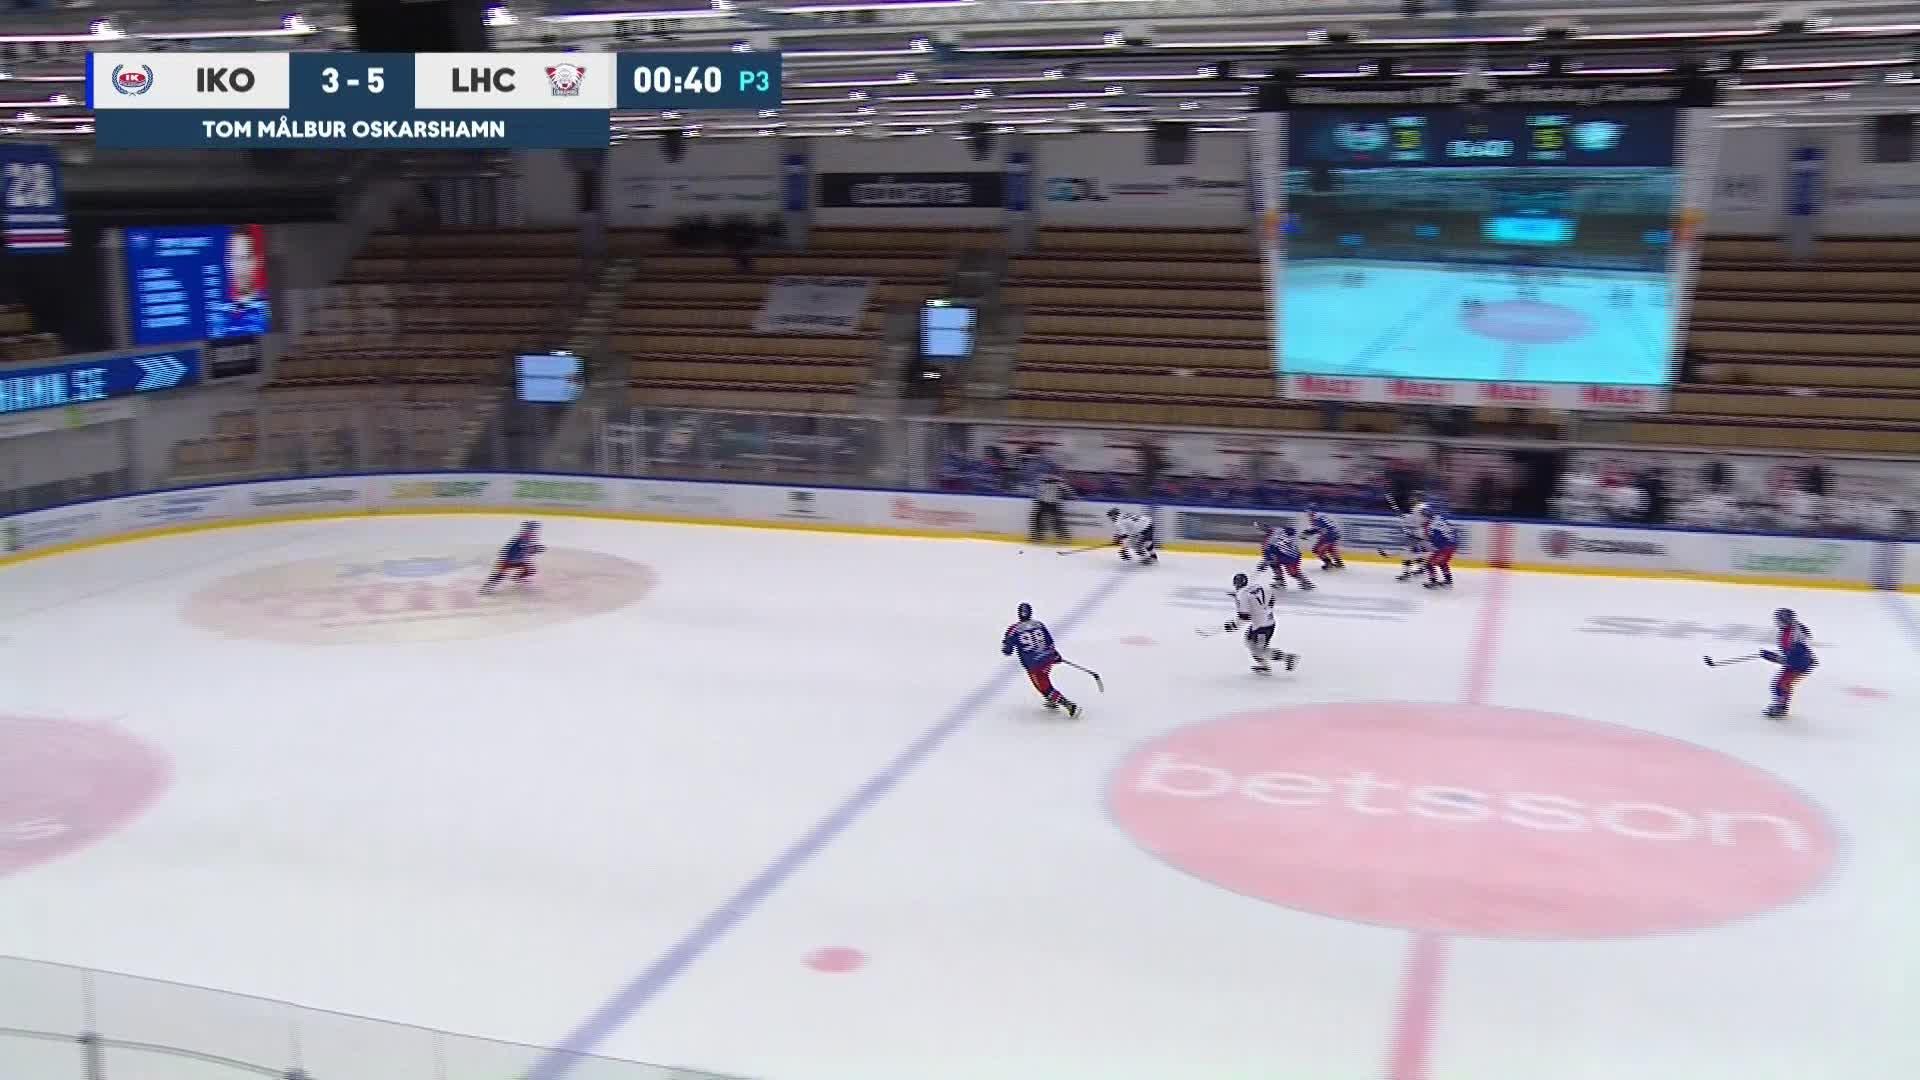 IK Oskarshamn - Linköping HC 3-6